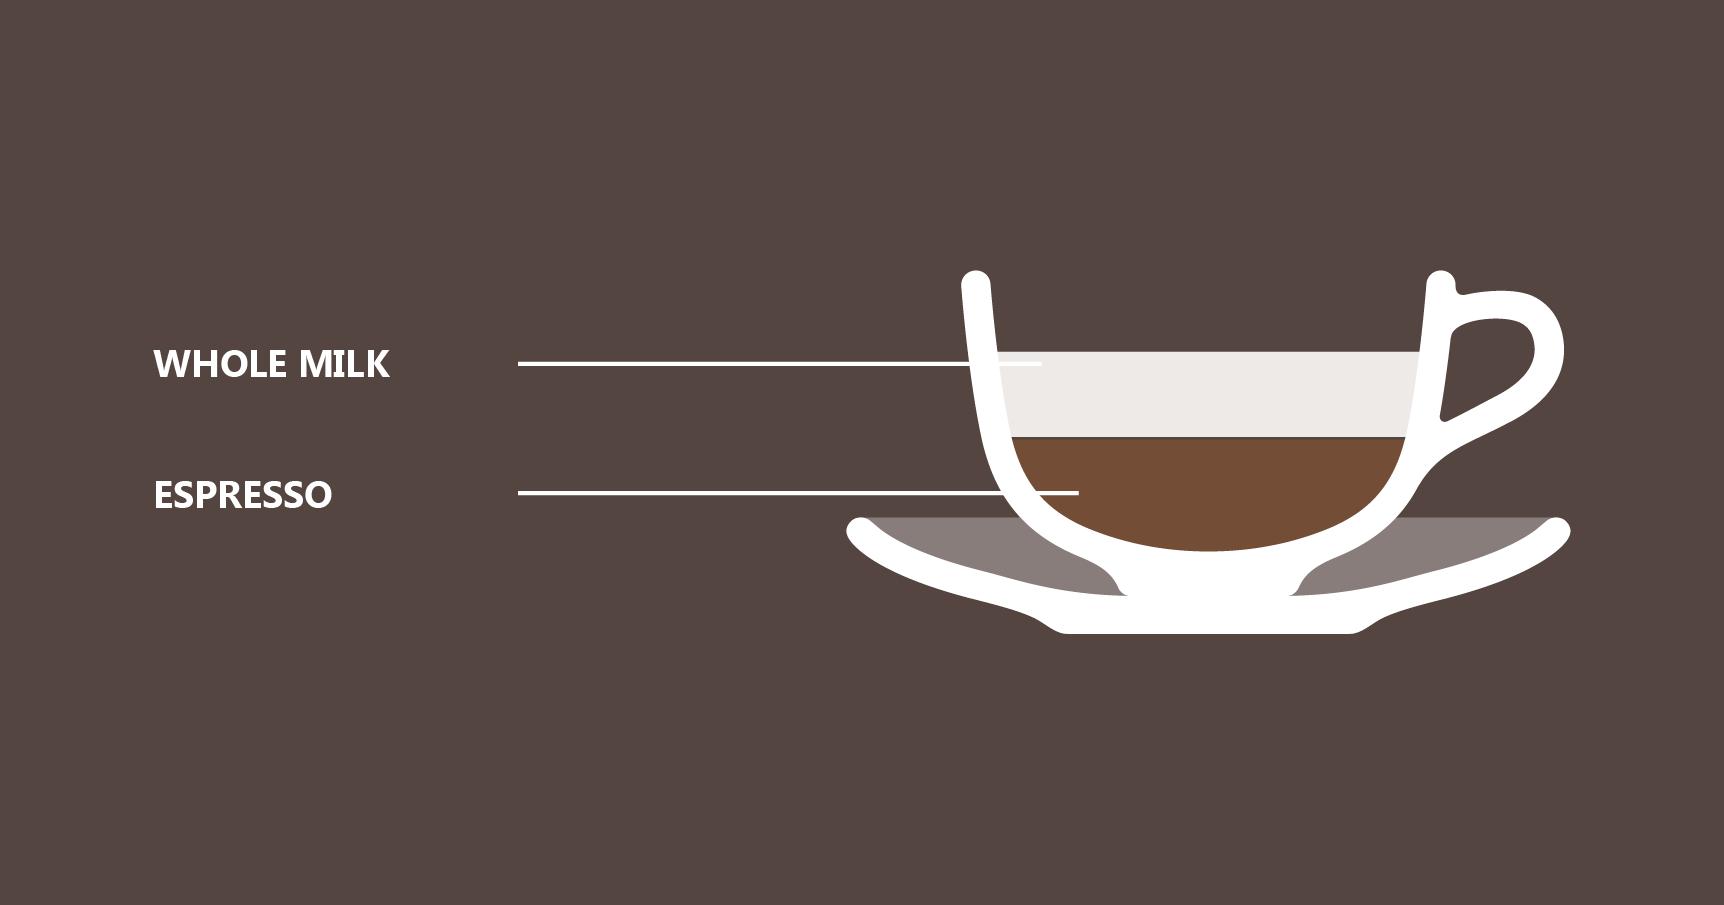 Classic Café Latte recipe illustration